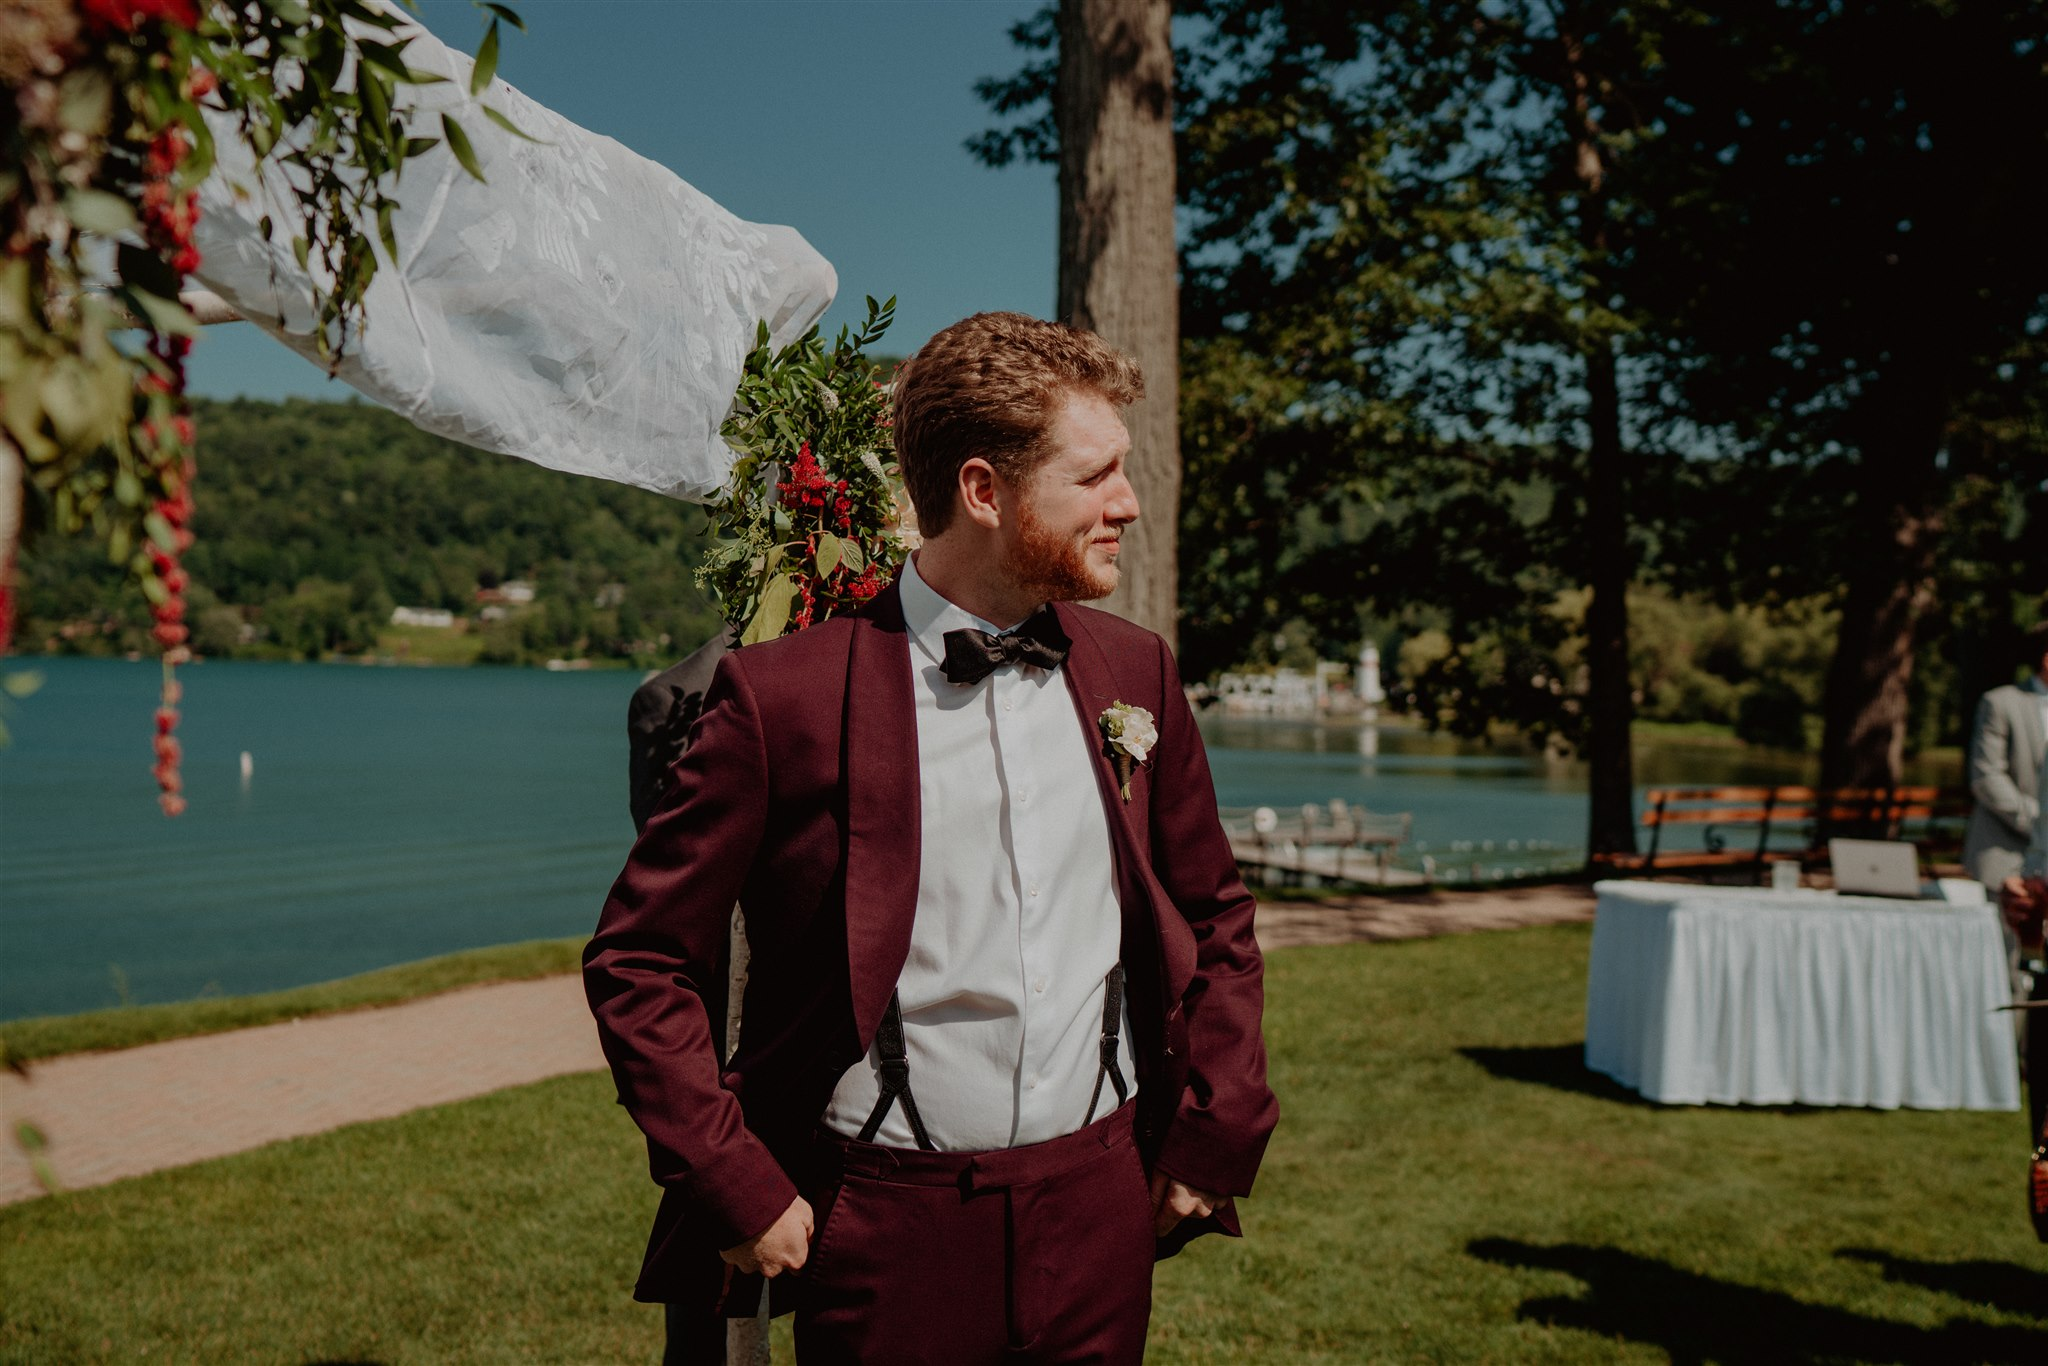 Chellise_Michael_Photography_Hudson_Valley_Wedding_Photographer_Otesaga_Hotel-3048.jpg